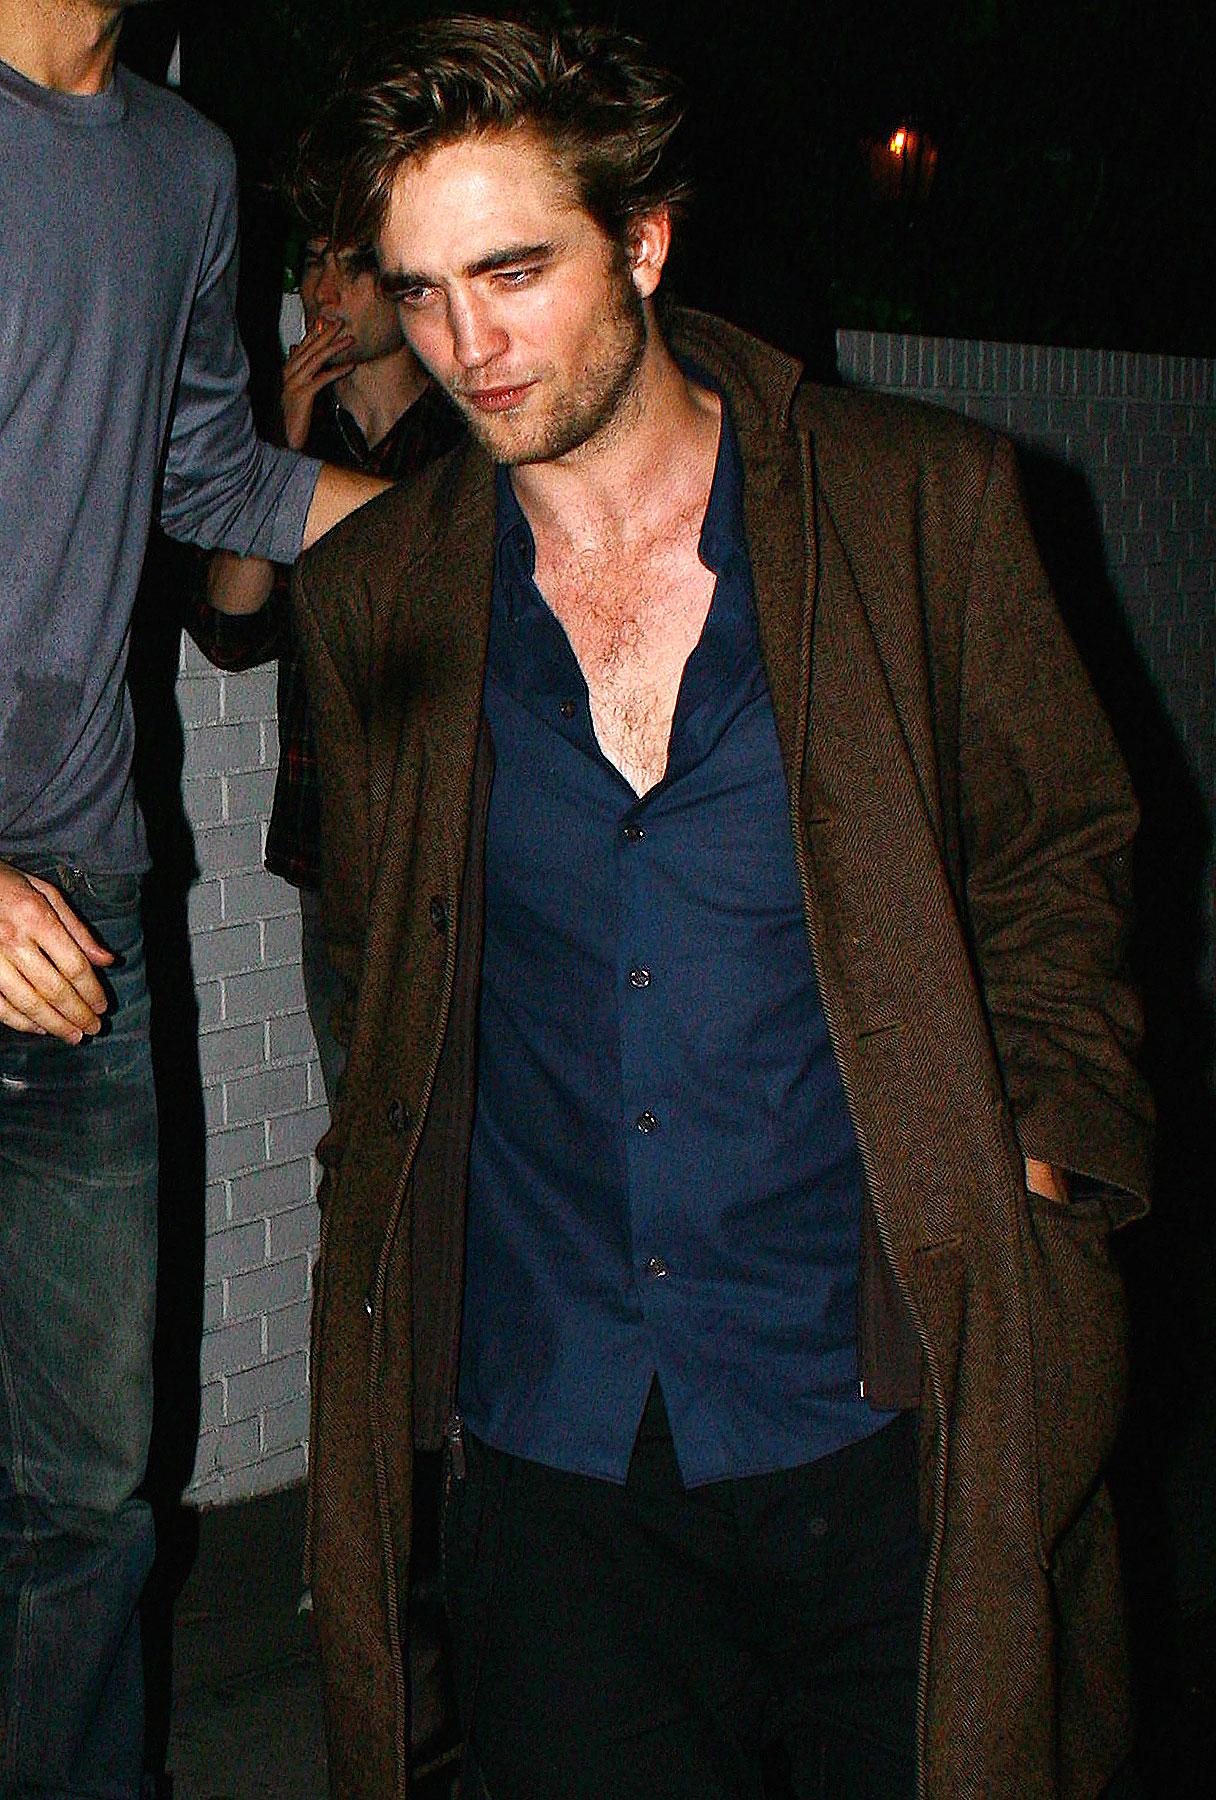 'New Moon' Crew: Robert Pattinson Stinks!